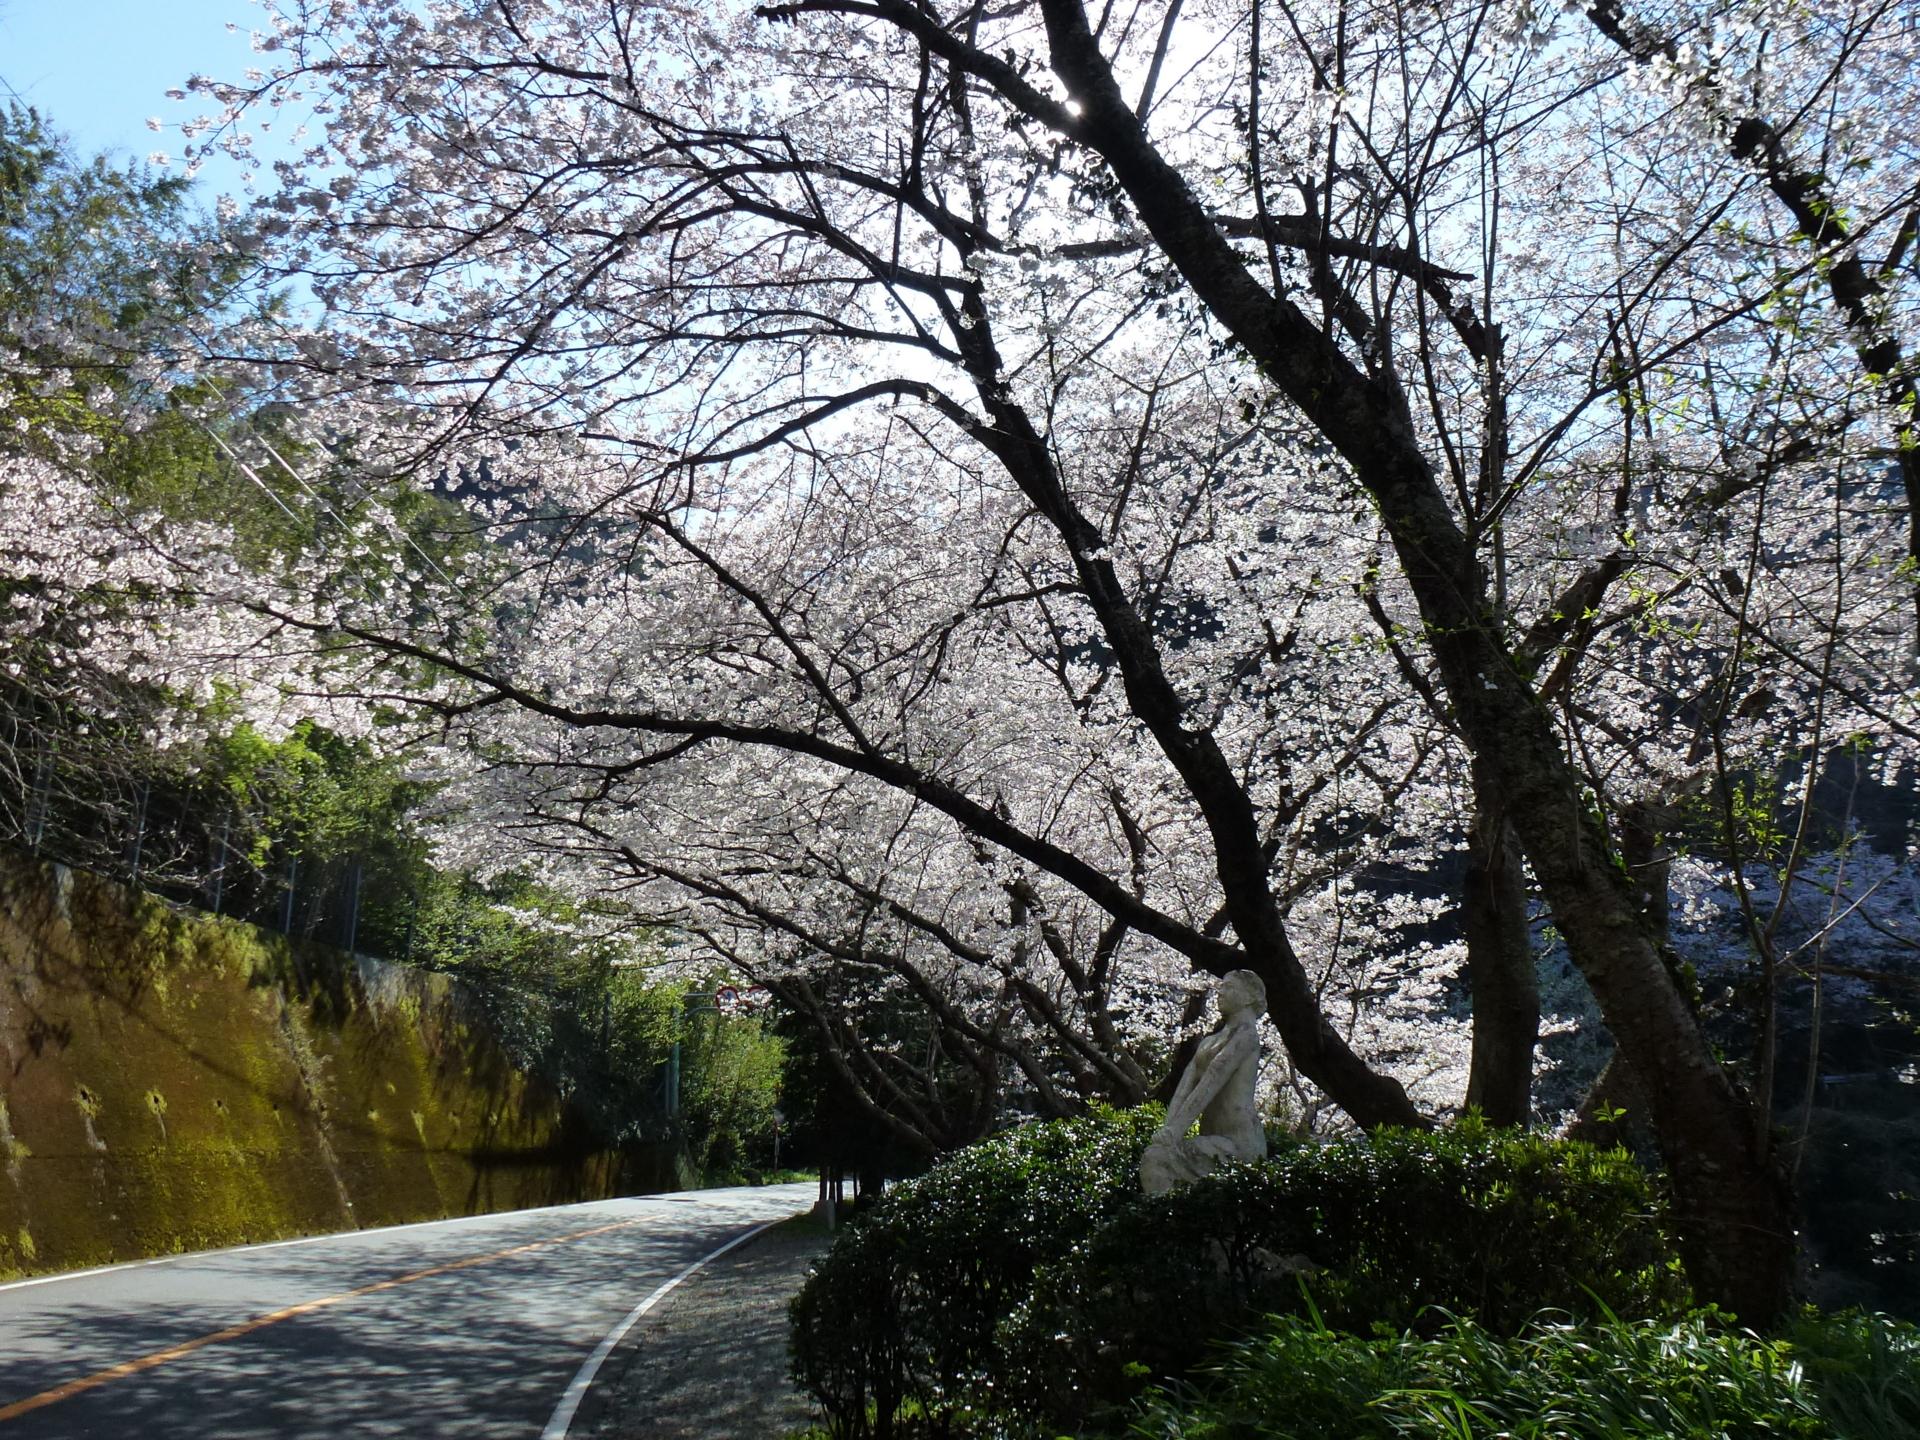 f:id:ToshUeno:20120401143328j:plain